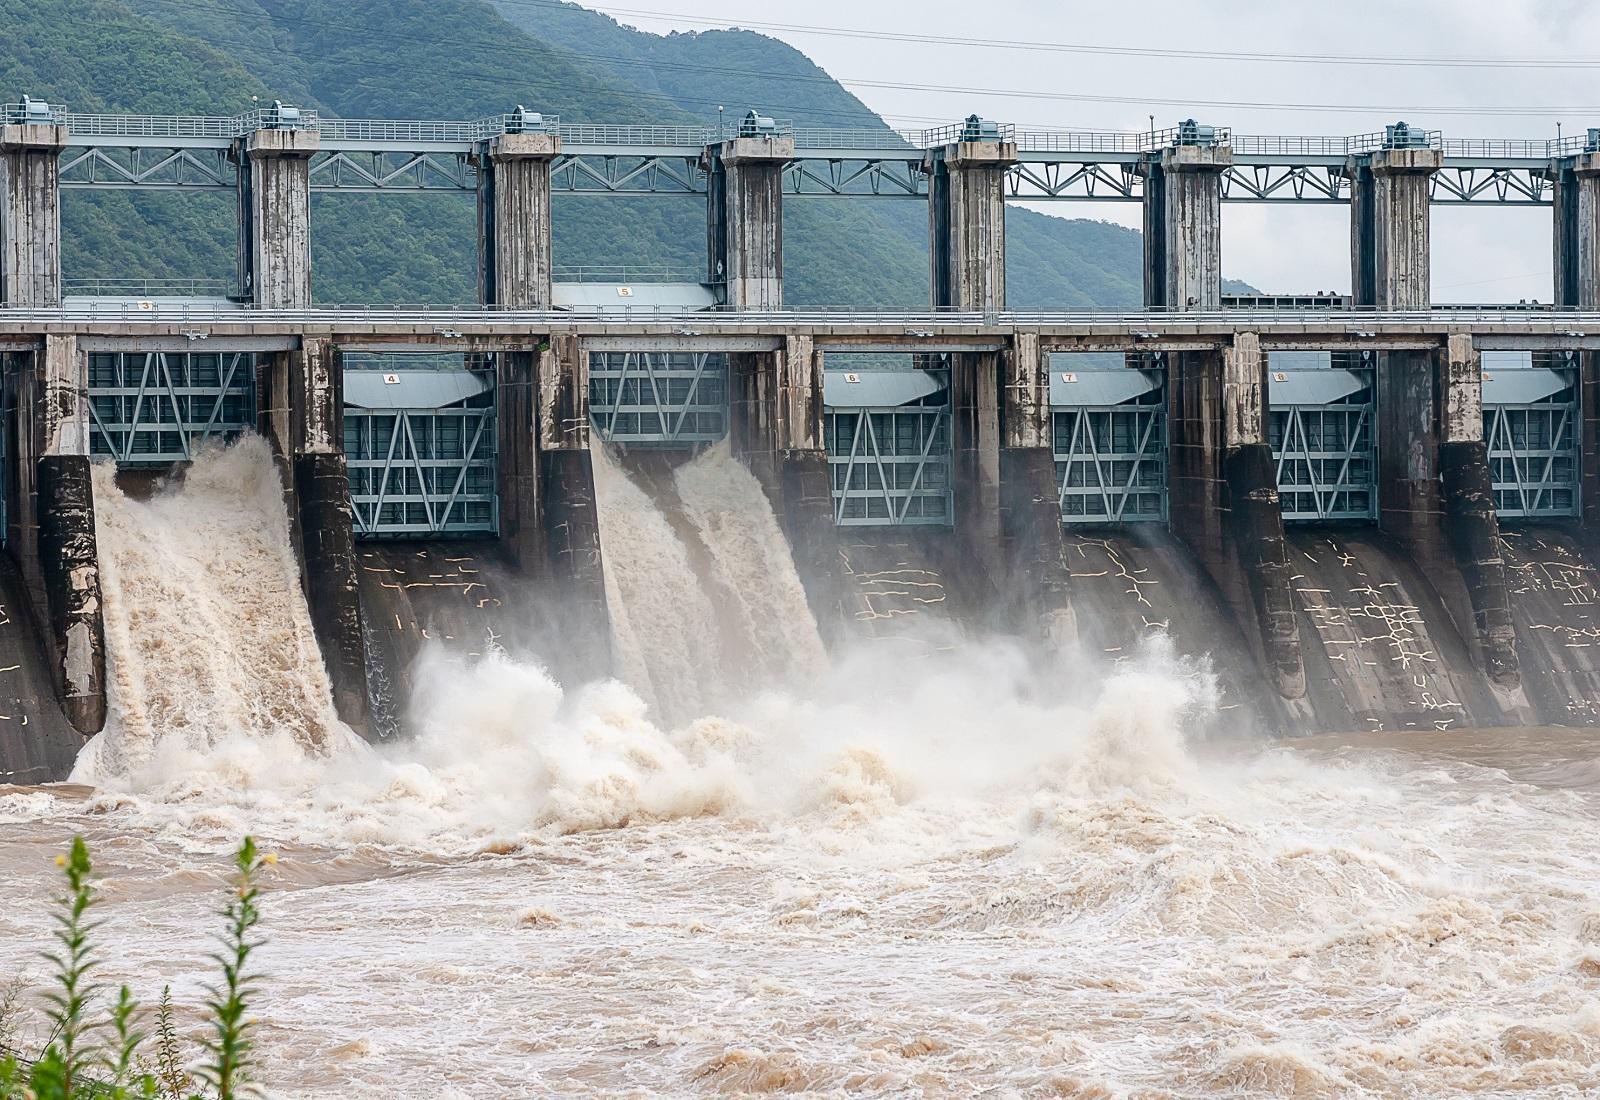 Sukhi Kanari Hydro Power Project Development Of 840 MW Run-of-River Hydro Project, 2007-2009